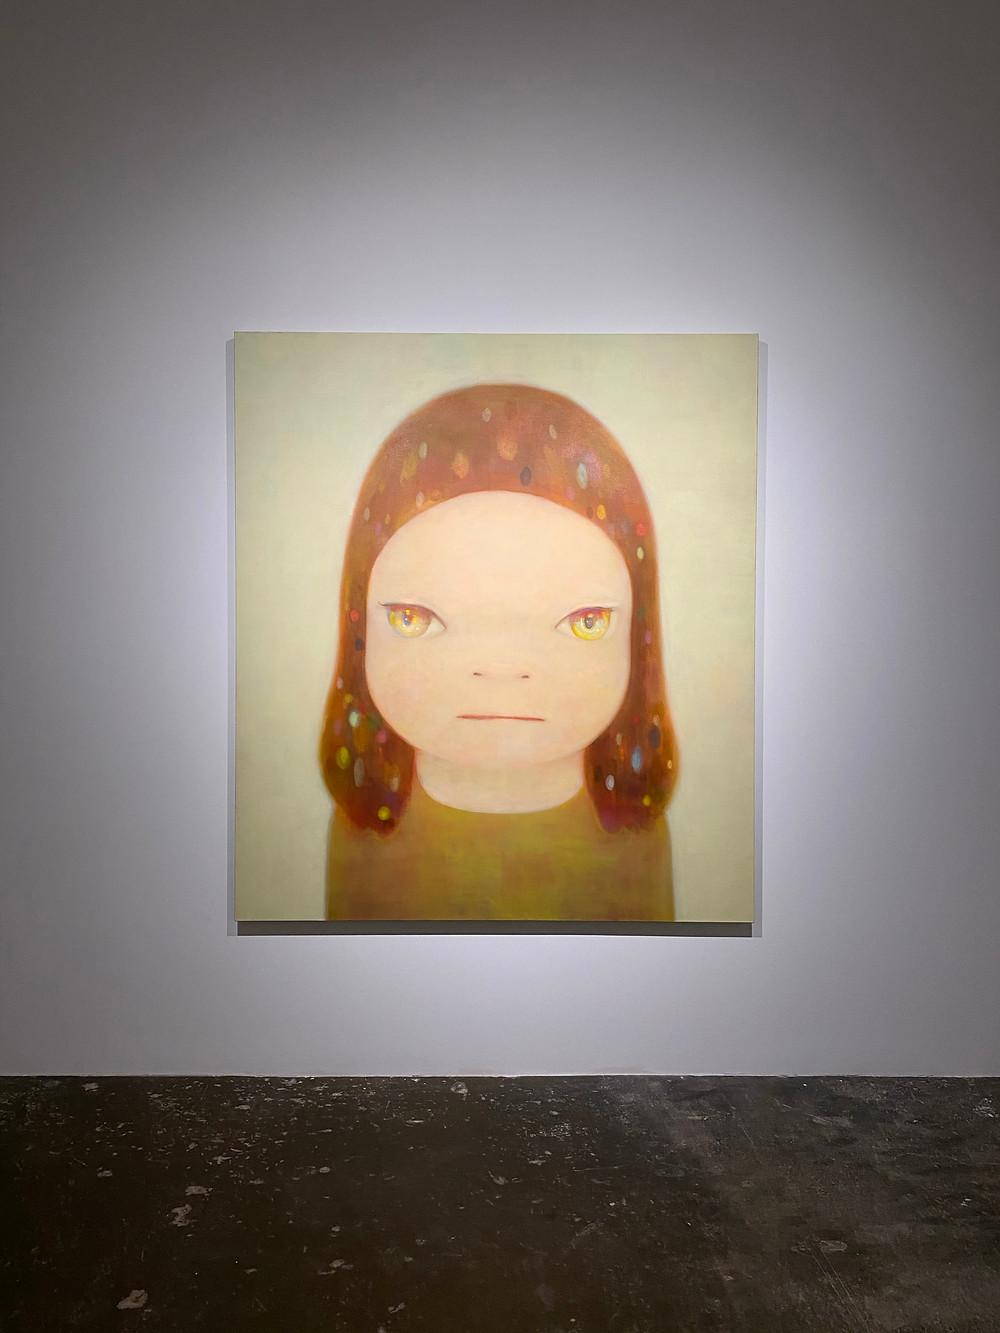 large painting of a girl by yoshimoto nara